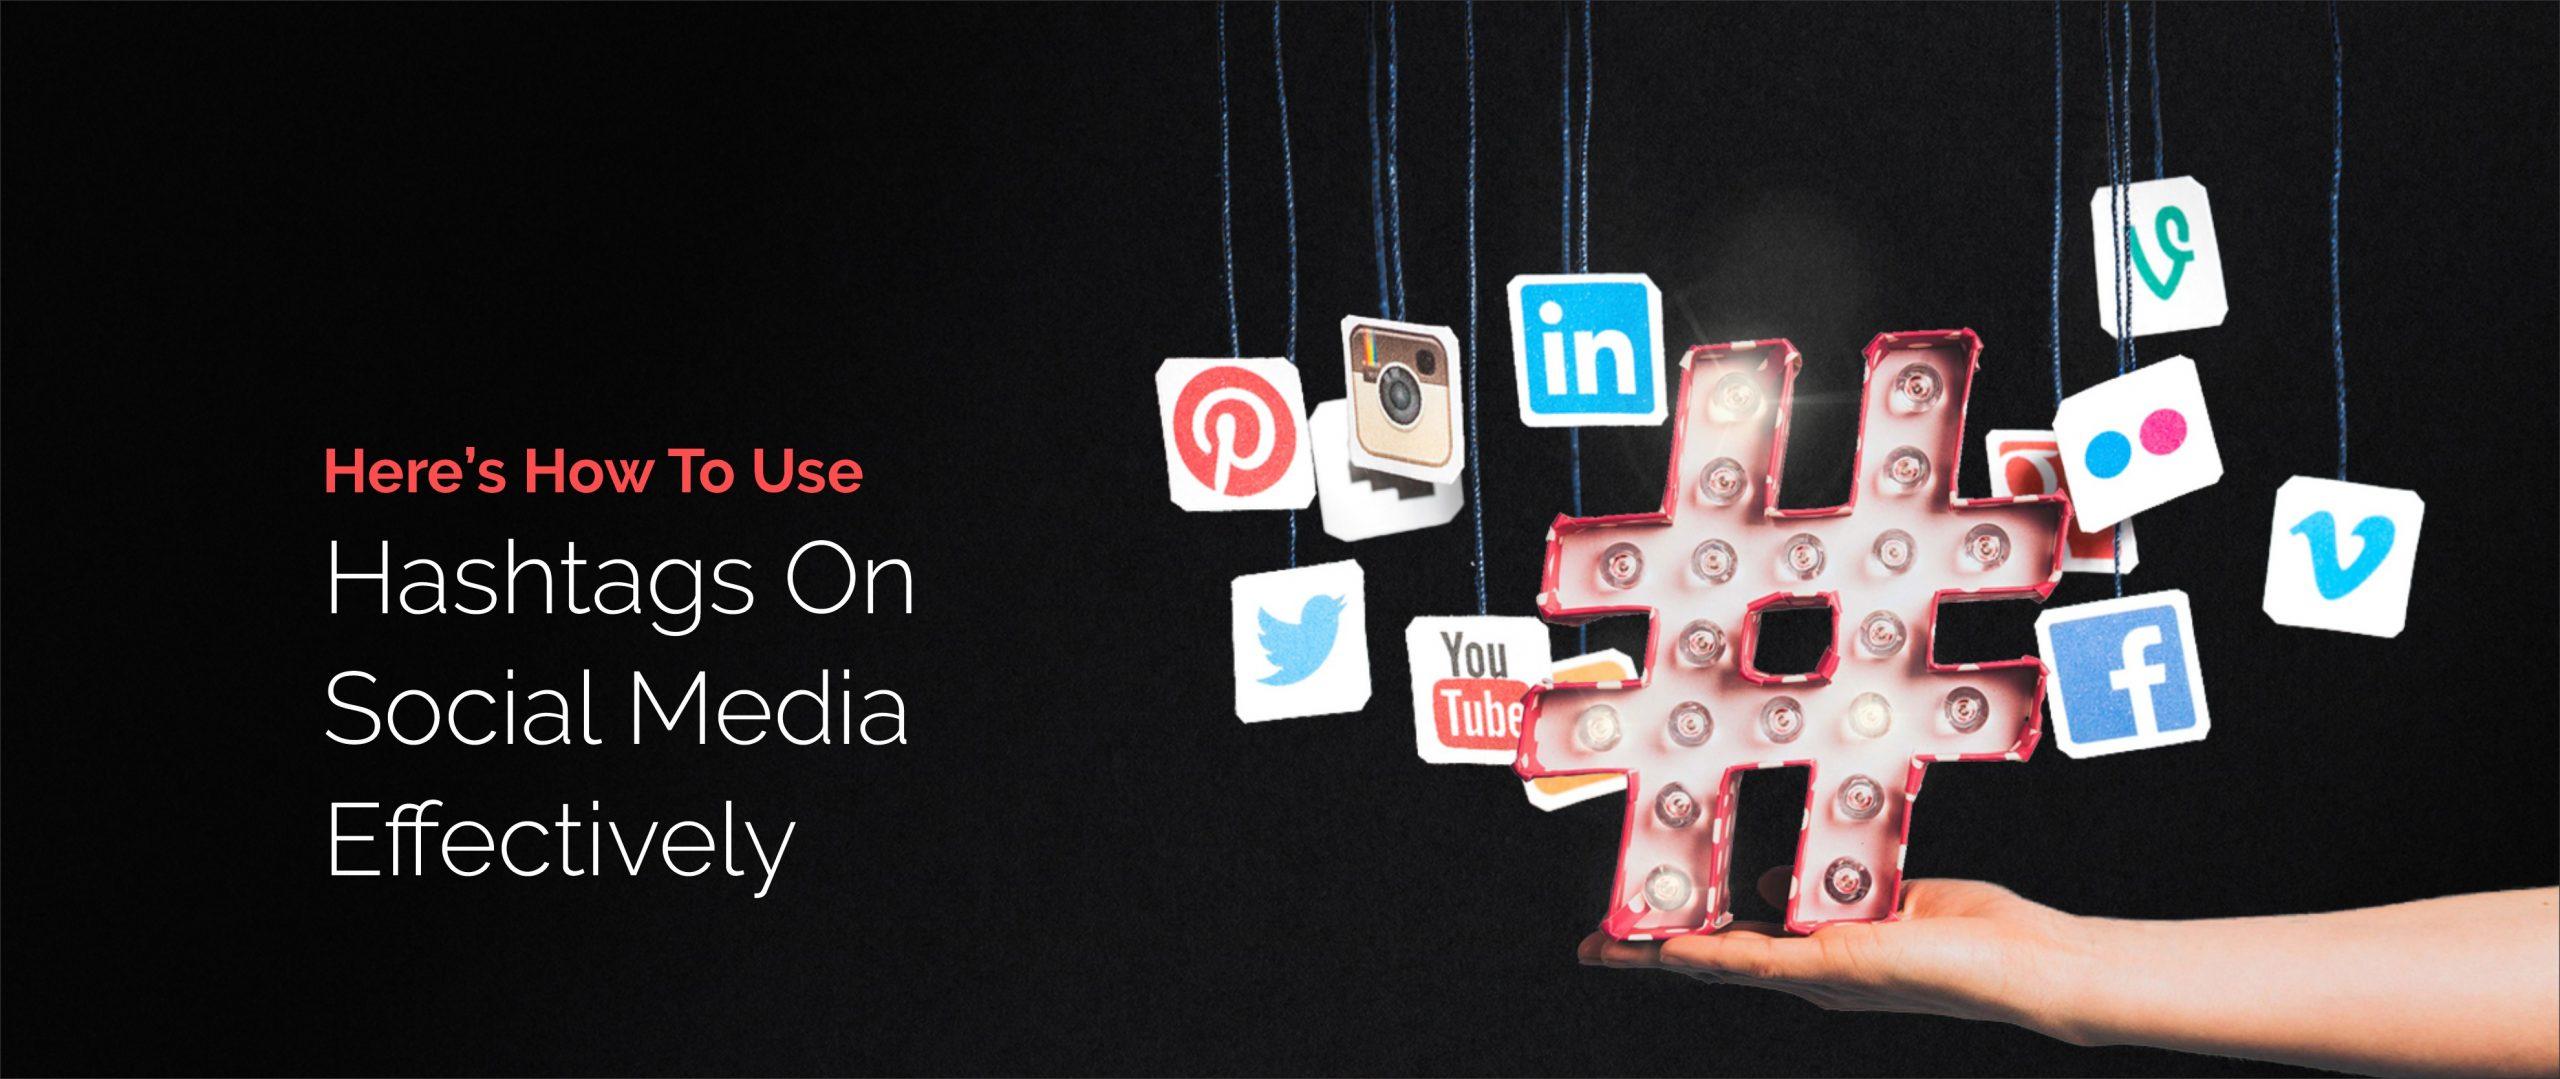 Hashtags Effectively On Social Media